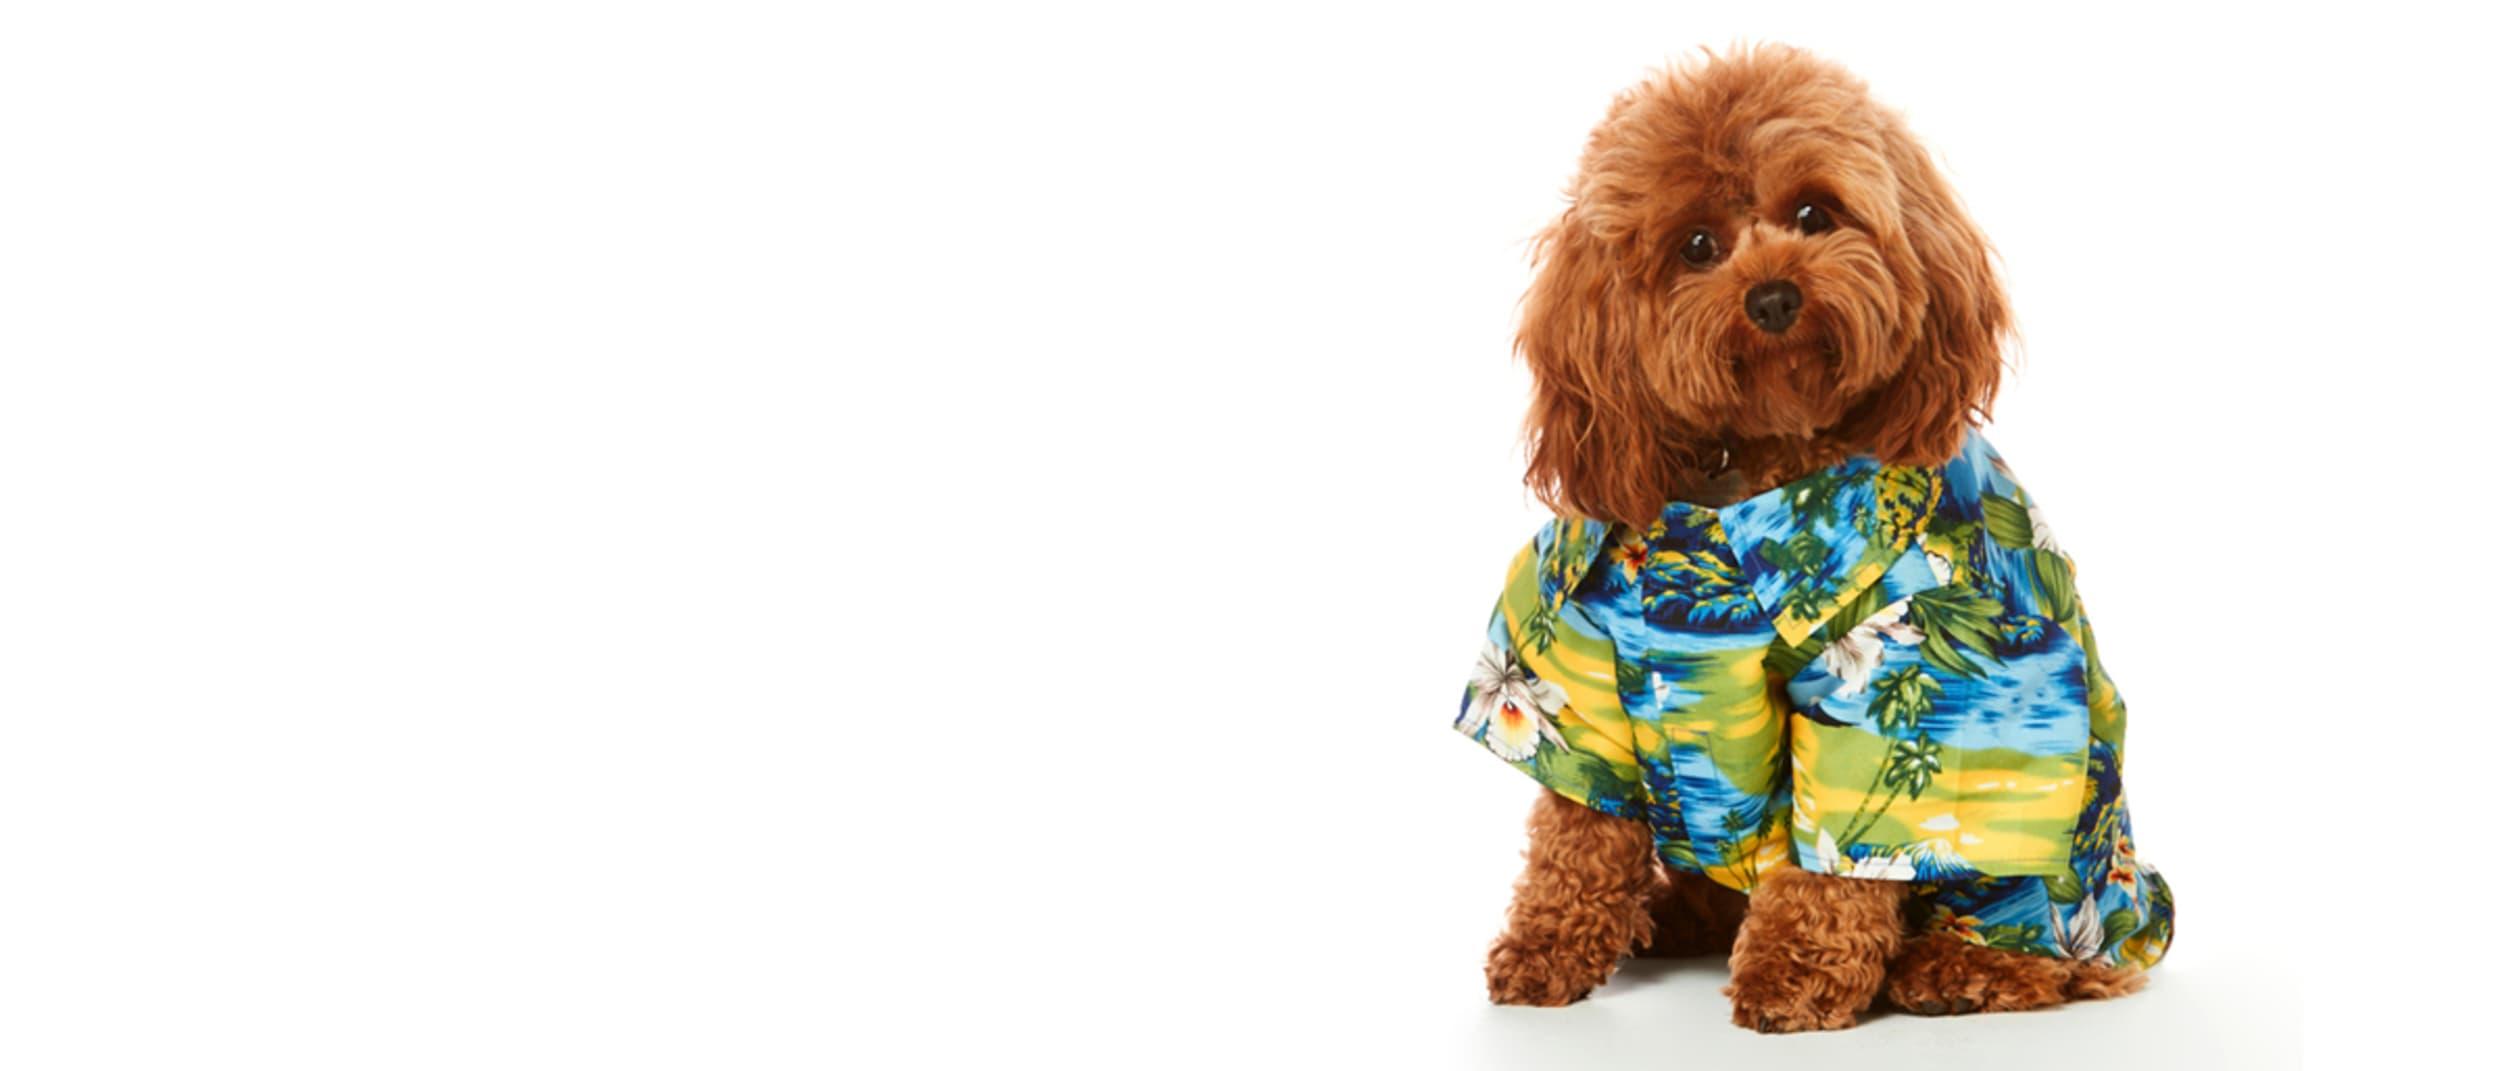 Join the Lowes Hawaiian shirt revolution!